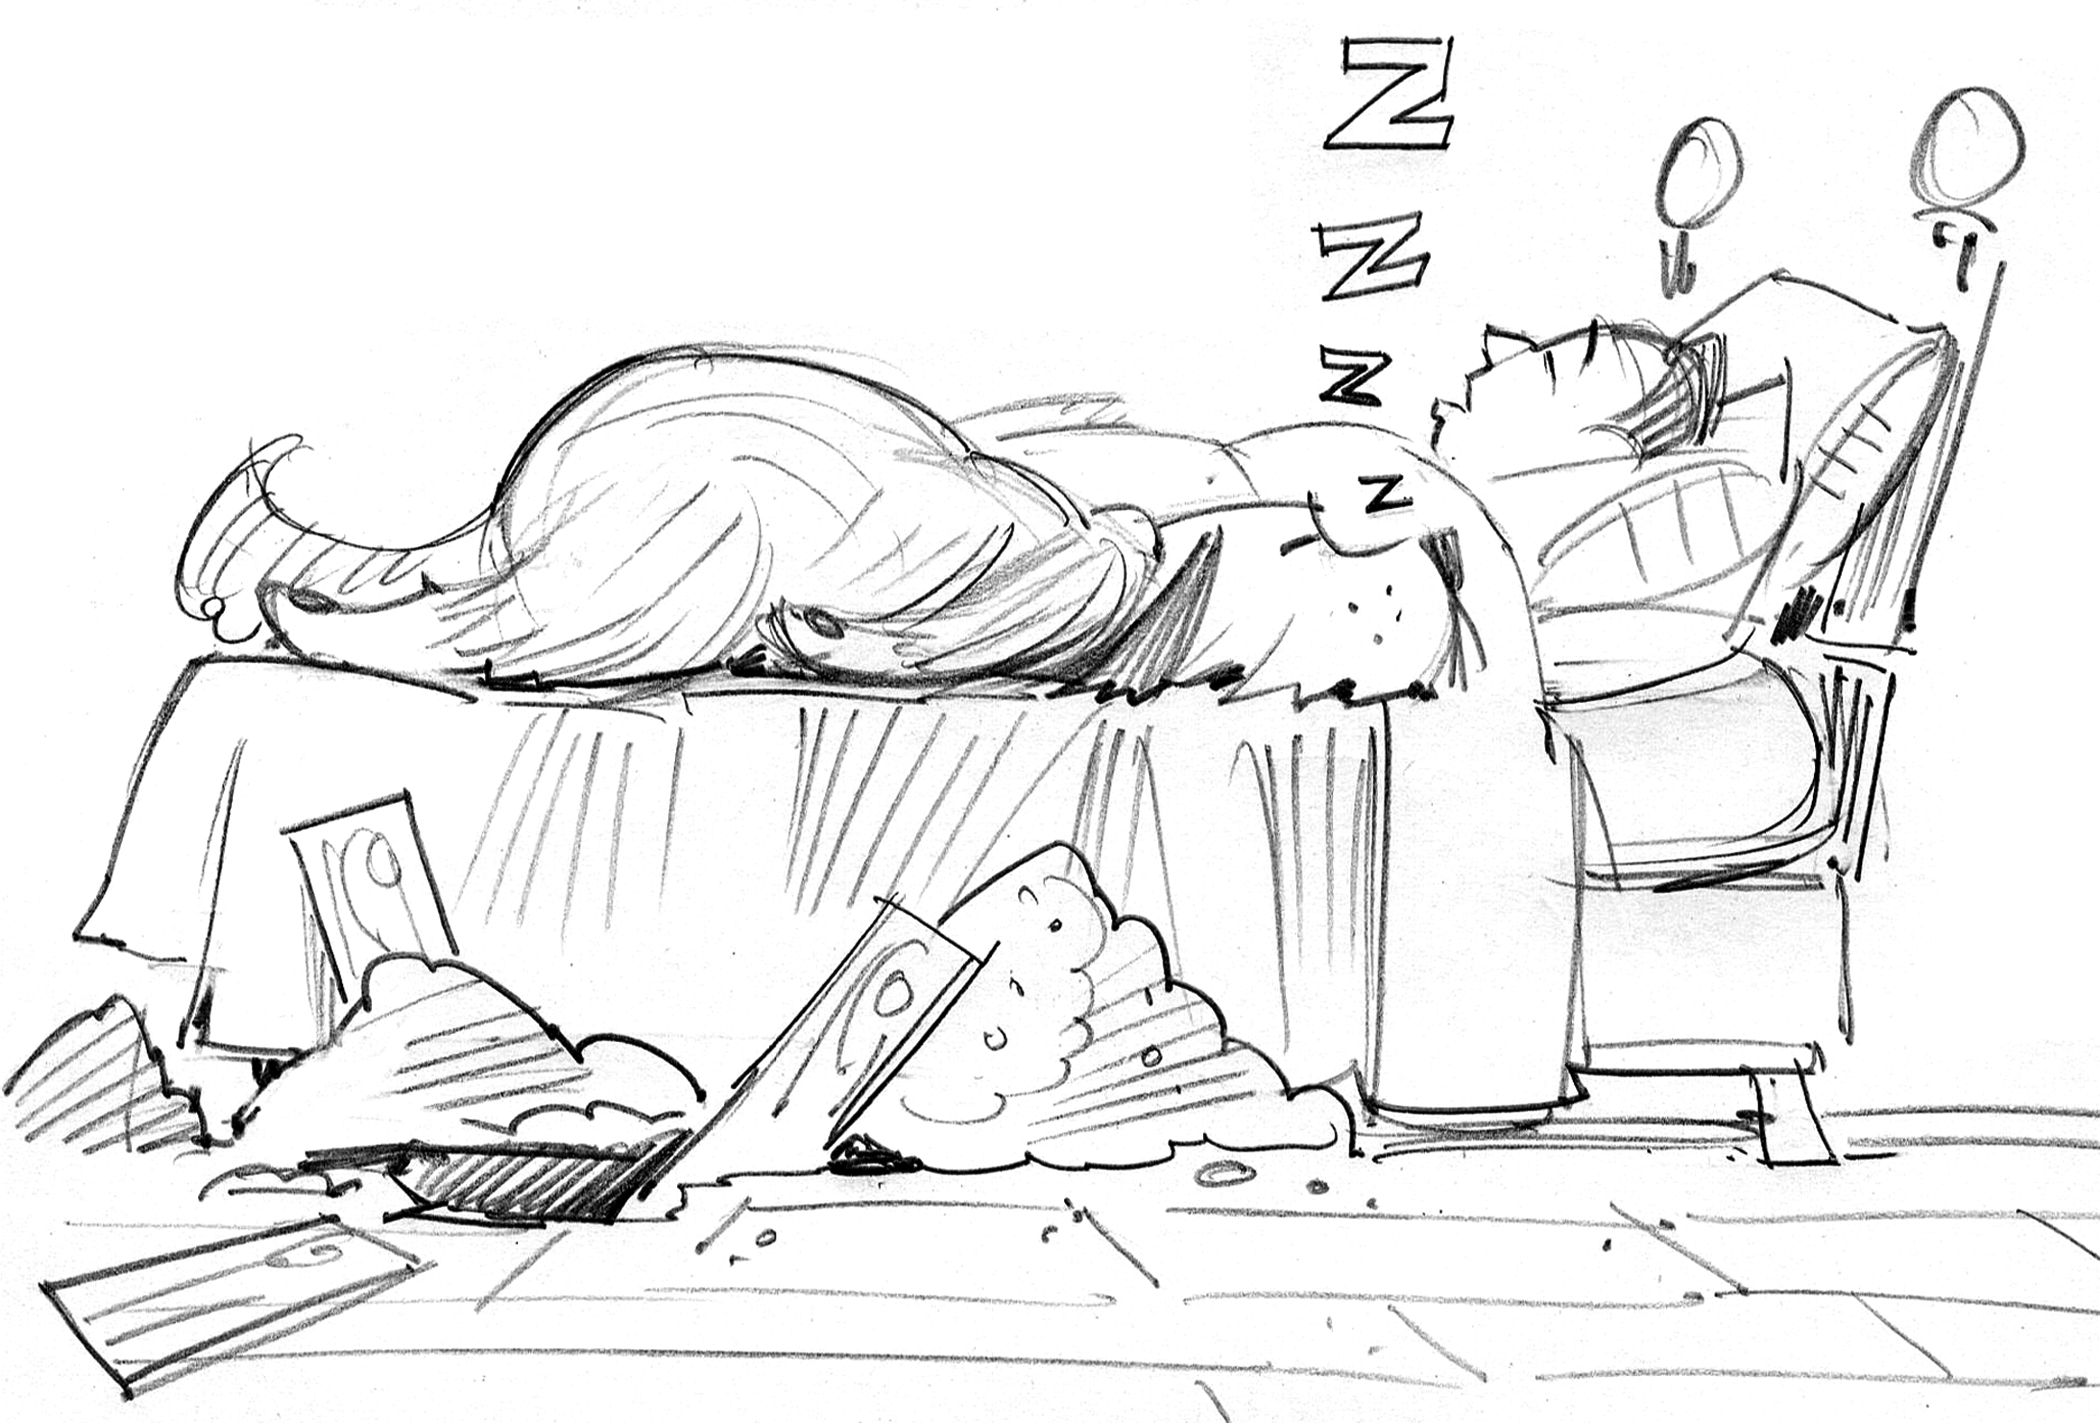 Sketch showing Doug finally coming home. Very similar to final art (not shown).